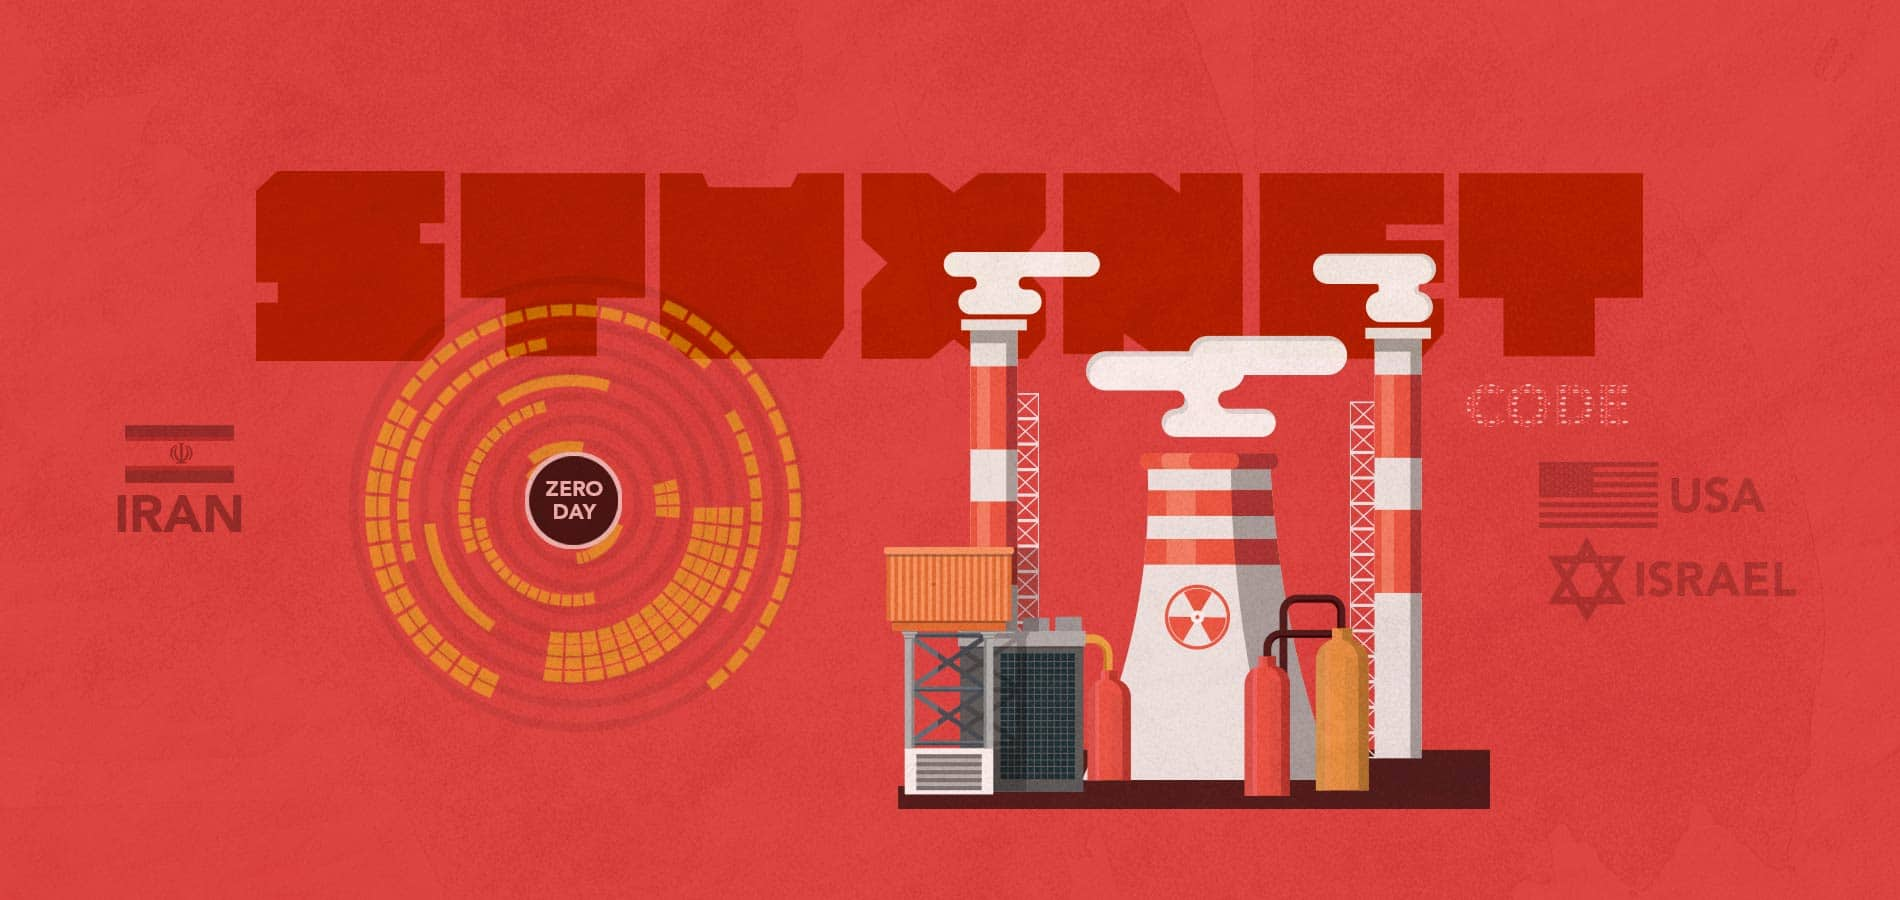 How Stuxnet almost started World War III